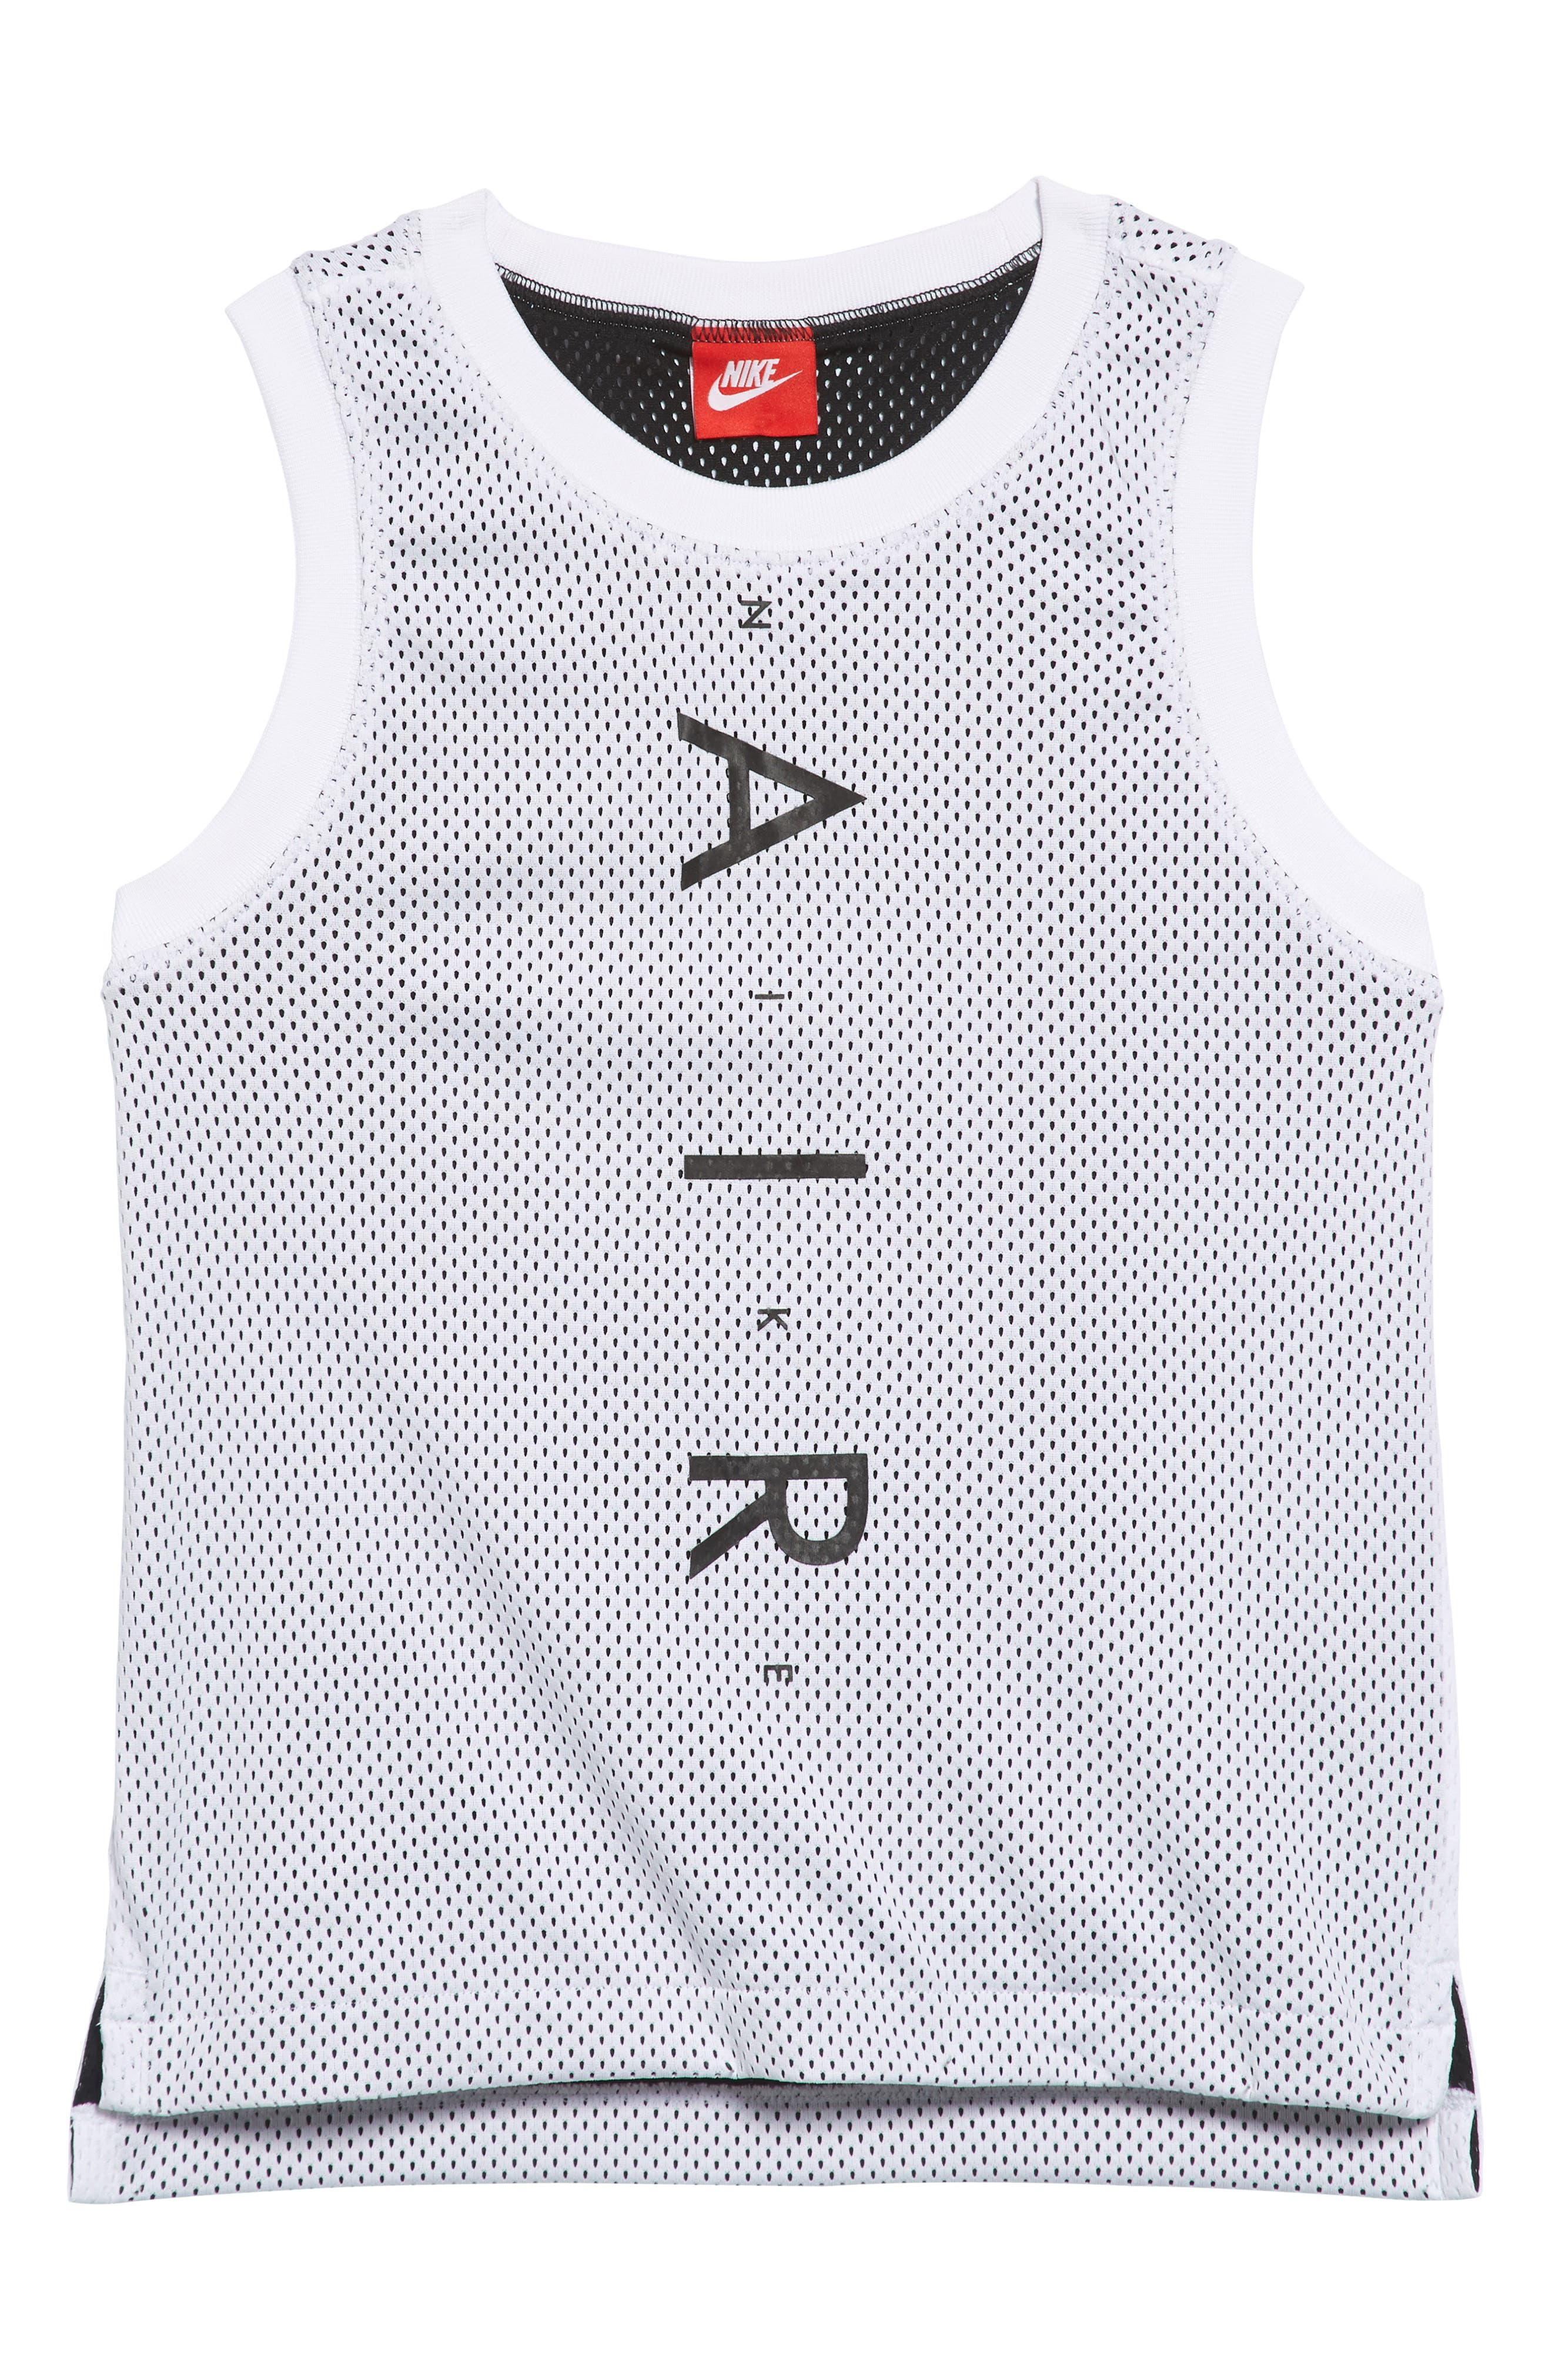 Air Dry Tank,                         Main,                         color, White/ Black